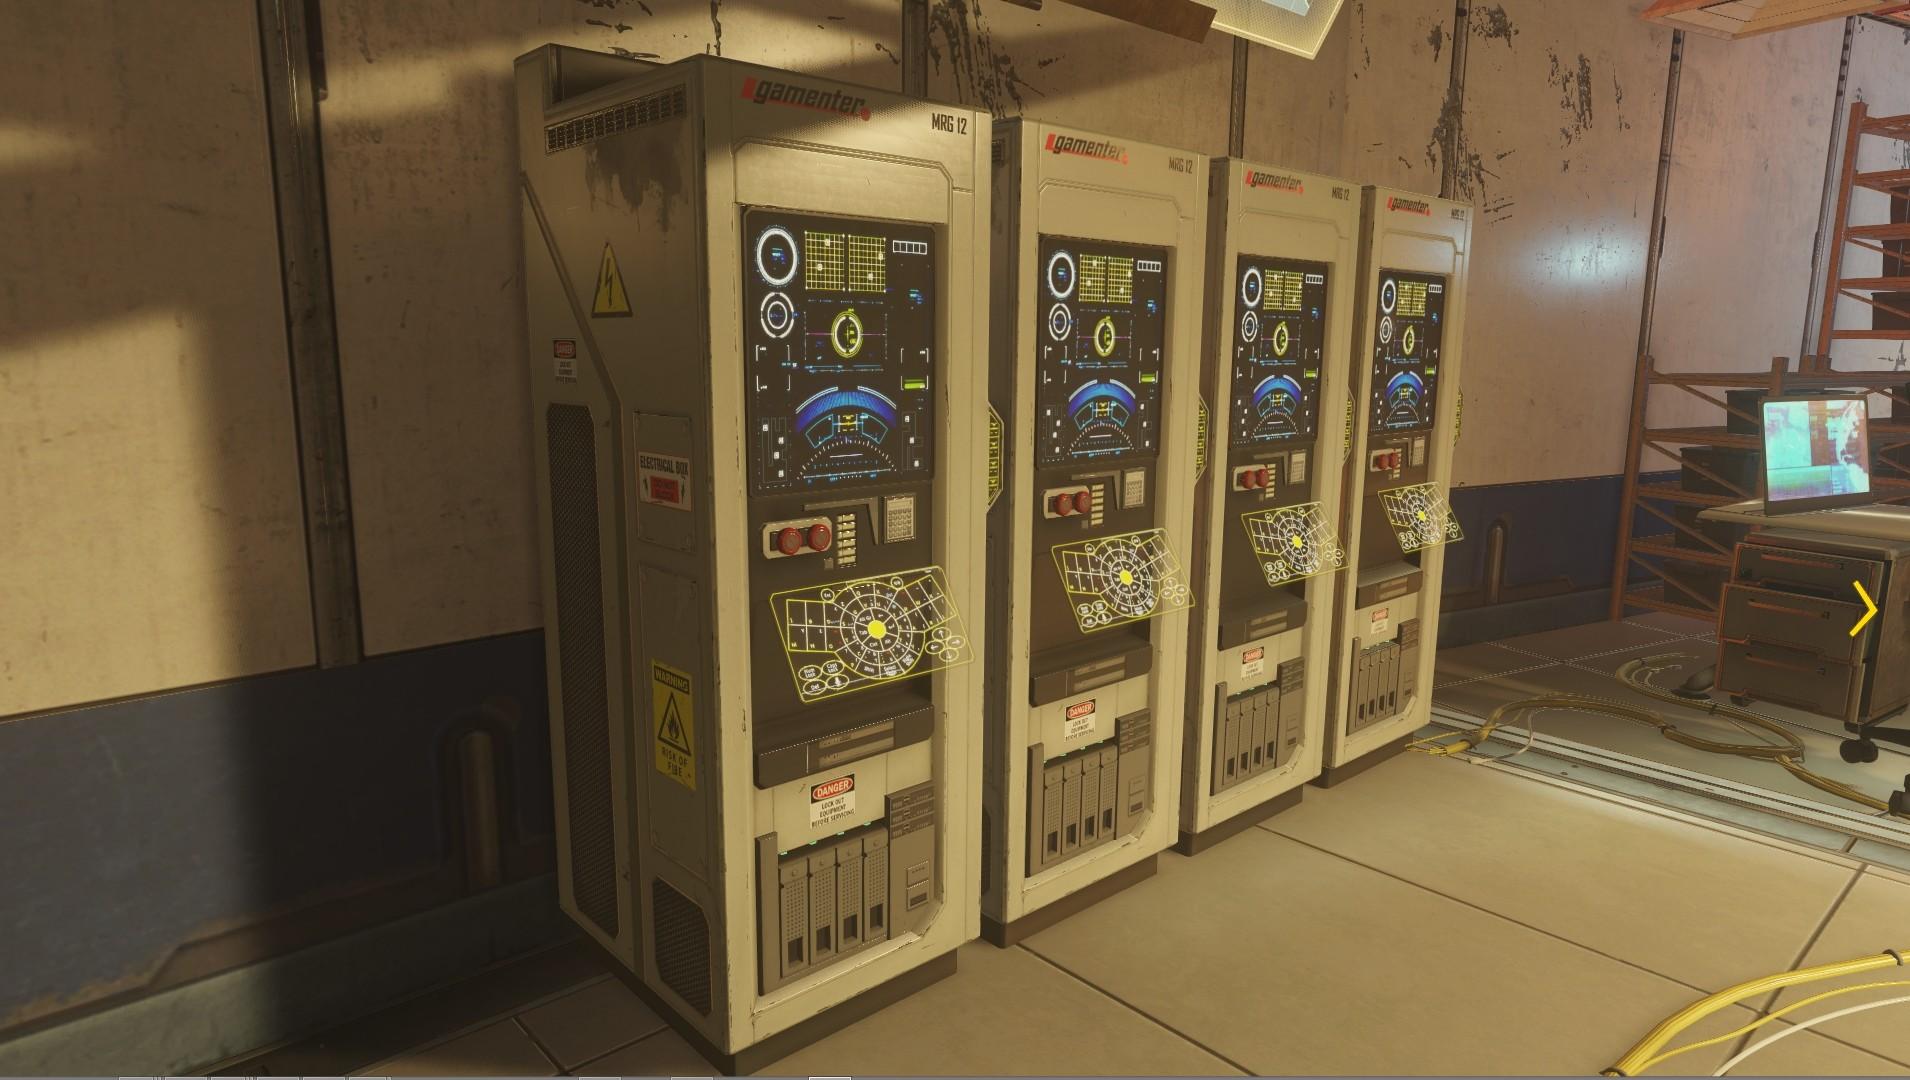 Brx boyles 06 terminal